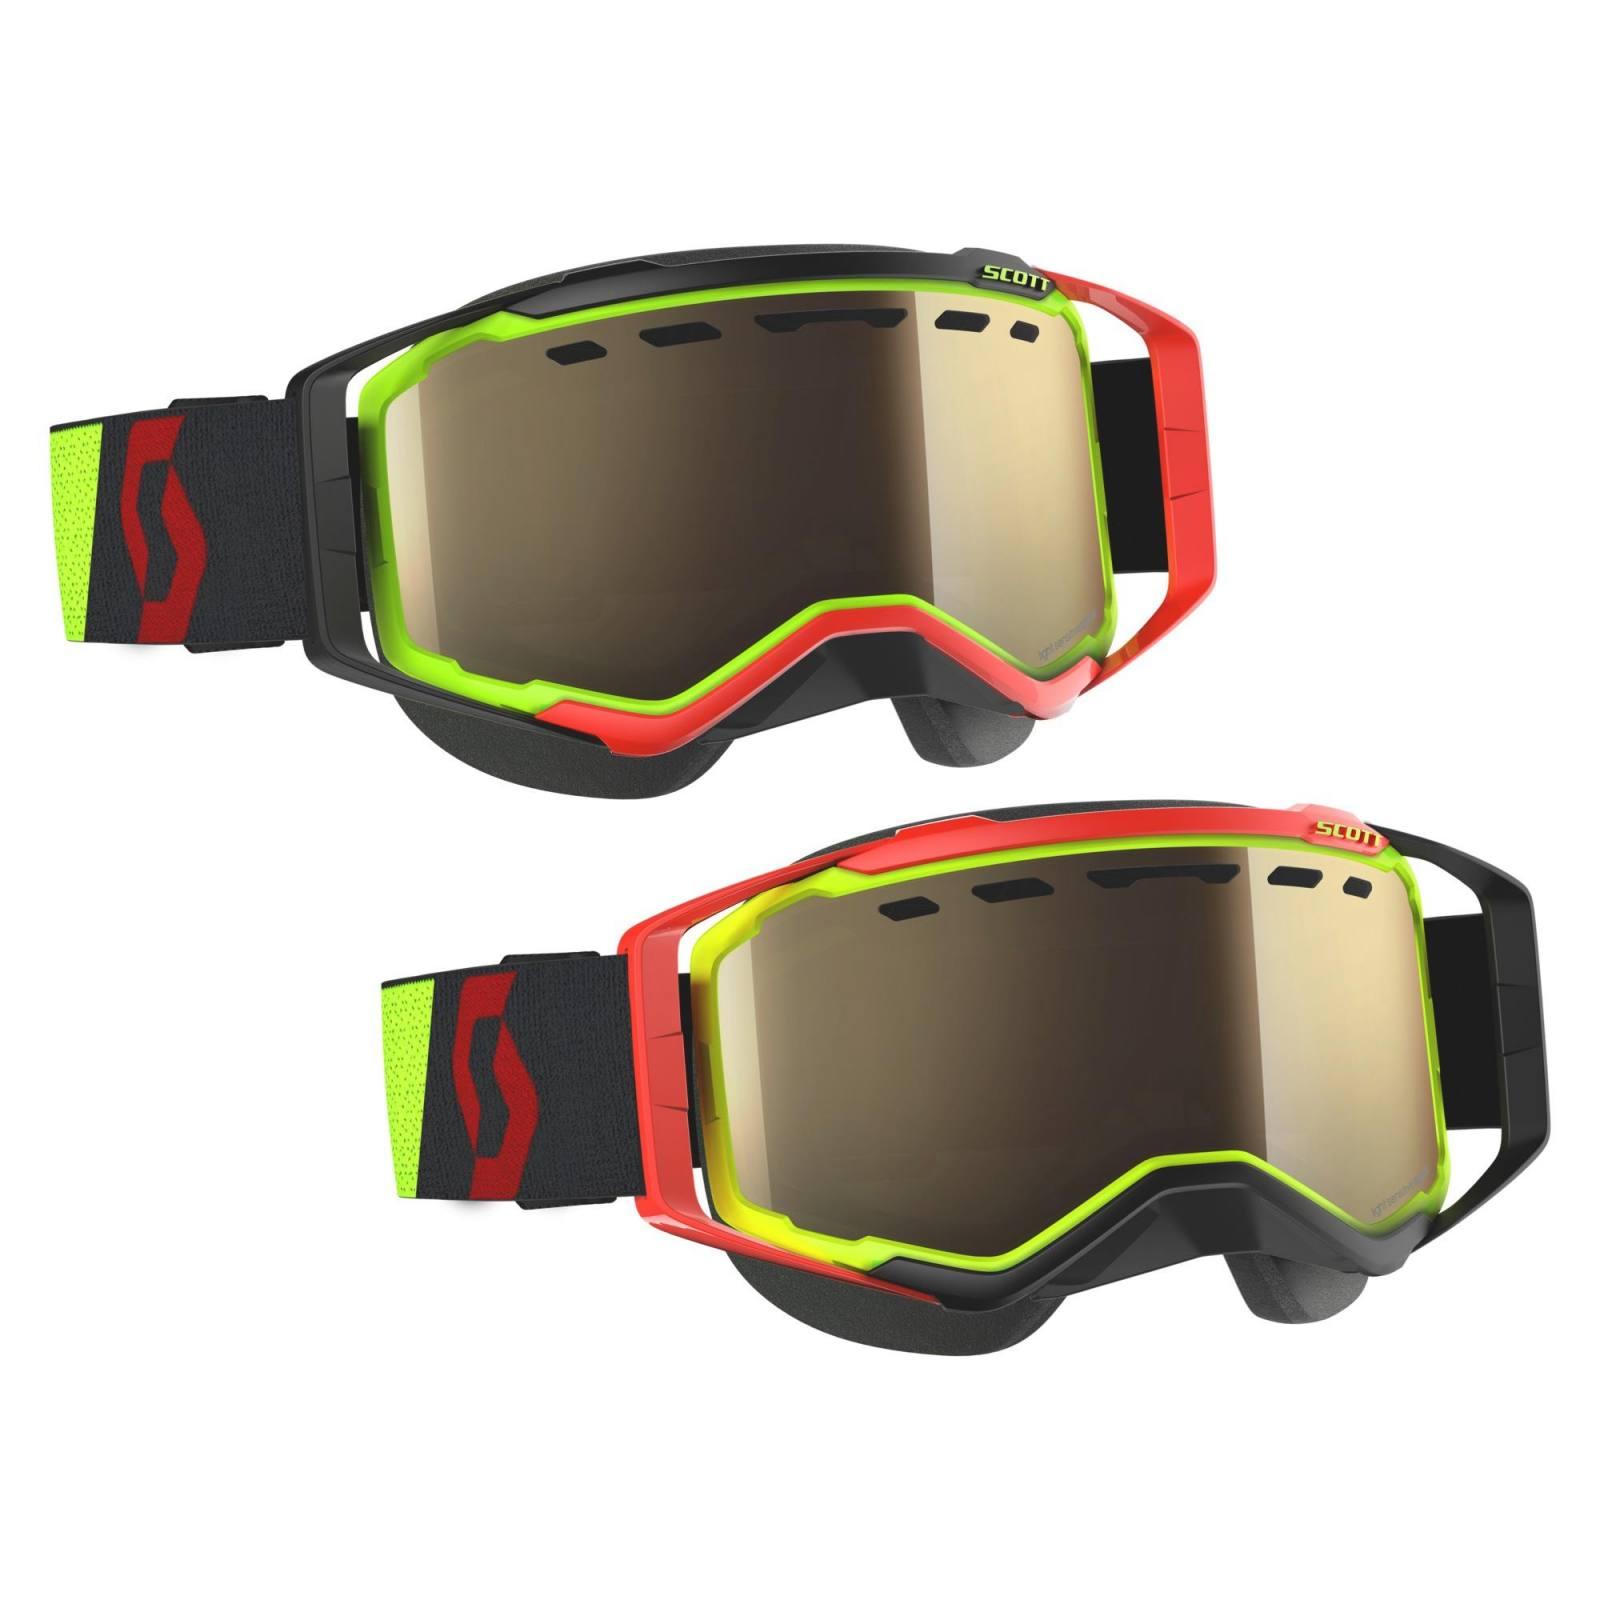 Scott USA Prospect Snow Cross Goggles Black//White w//Clear Lens 262581-1007043